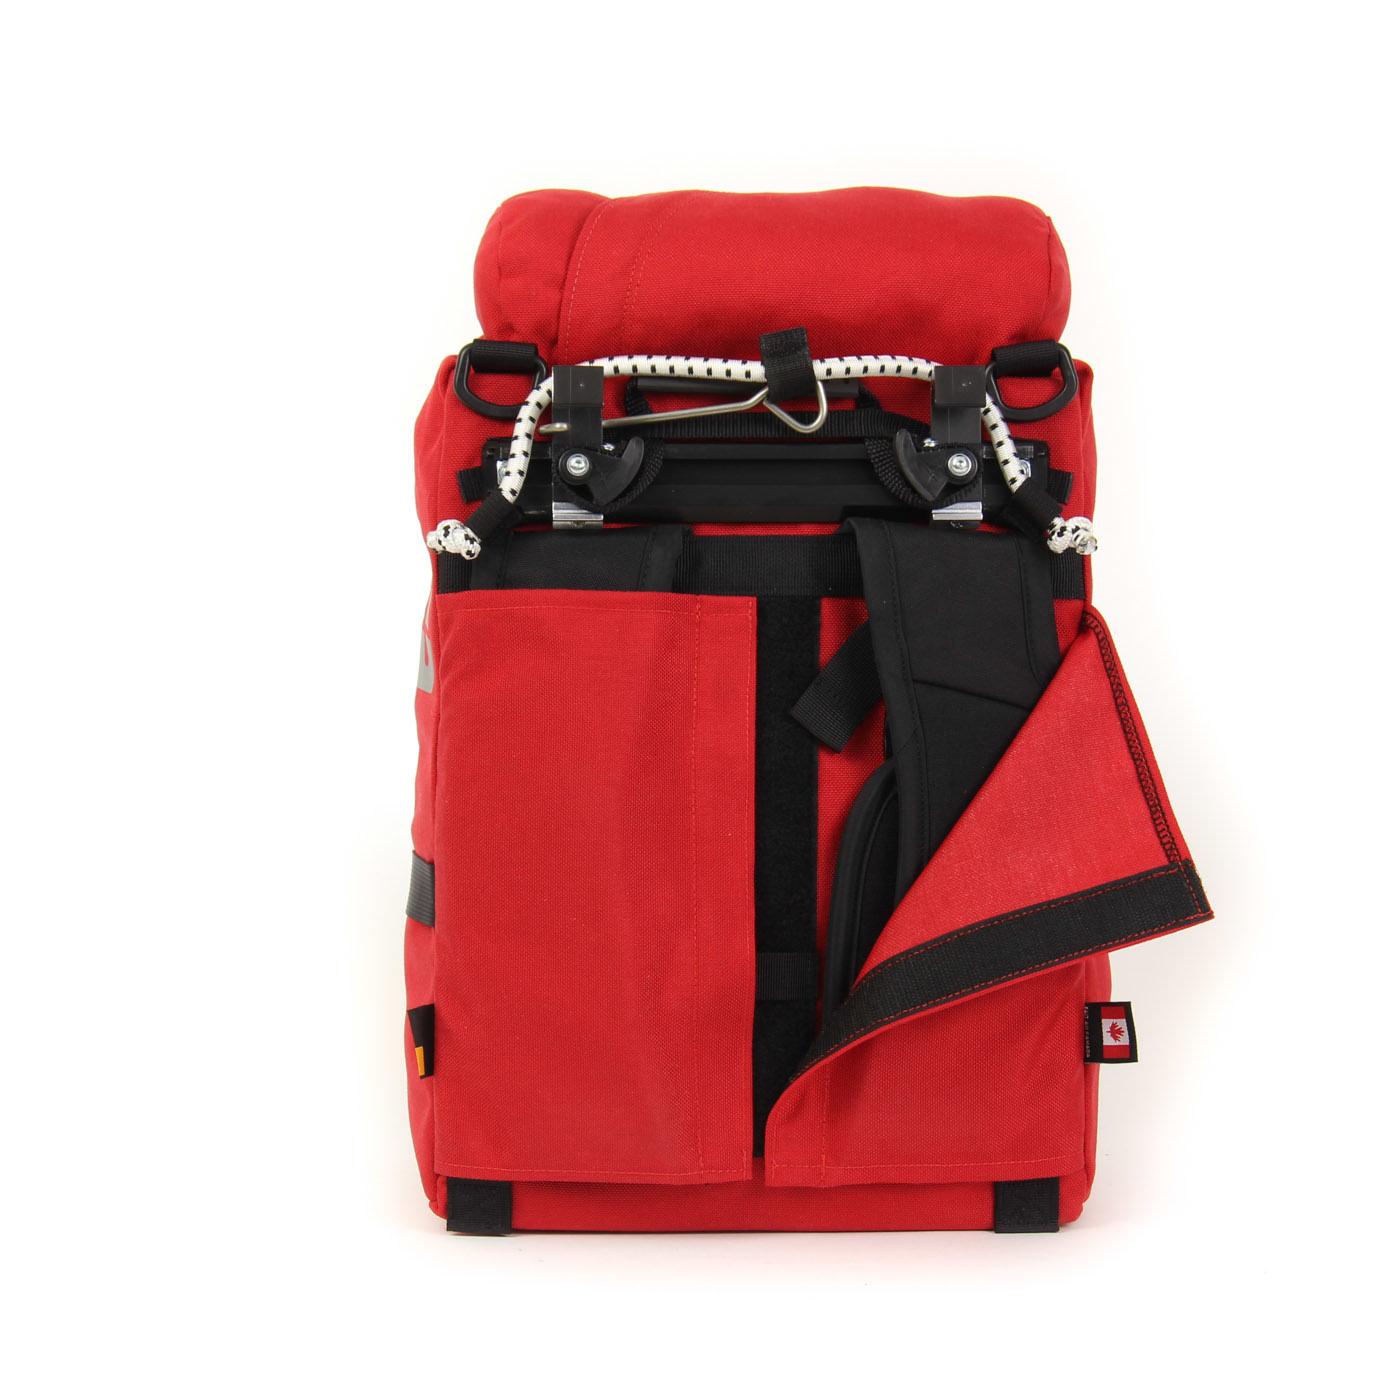 Arkel Arkel GT-18 Convertible Backpack Pannier (Unit)